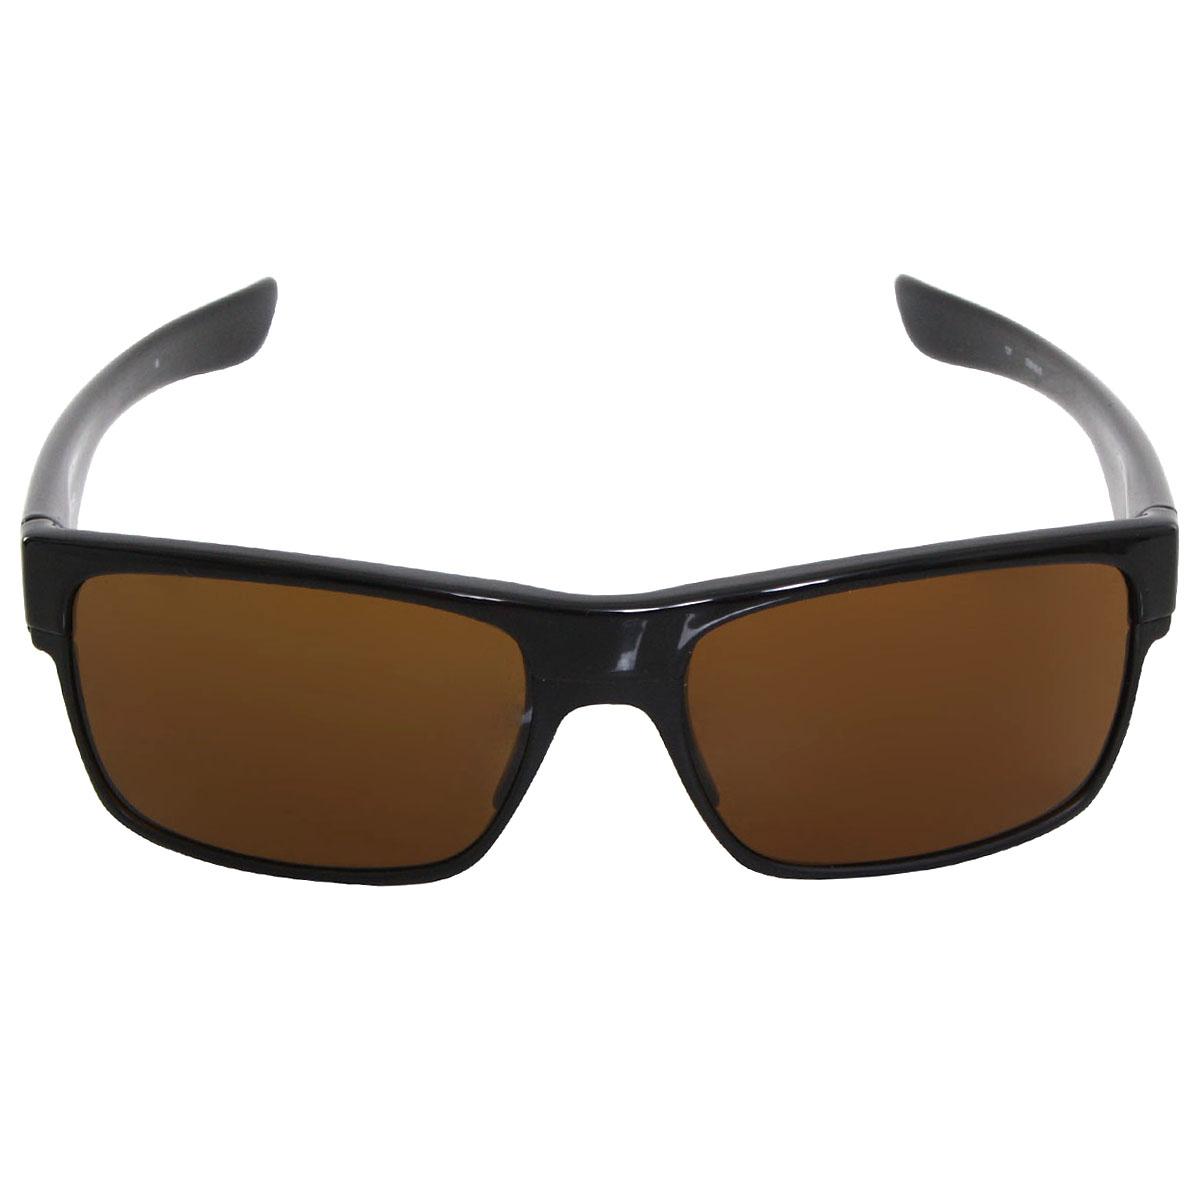 9a78846b7c27c Óculos Oakley TwoFace Polished Black Dark Bronze passe o mouse para ver em  zoom